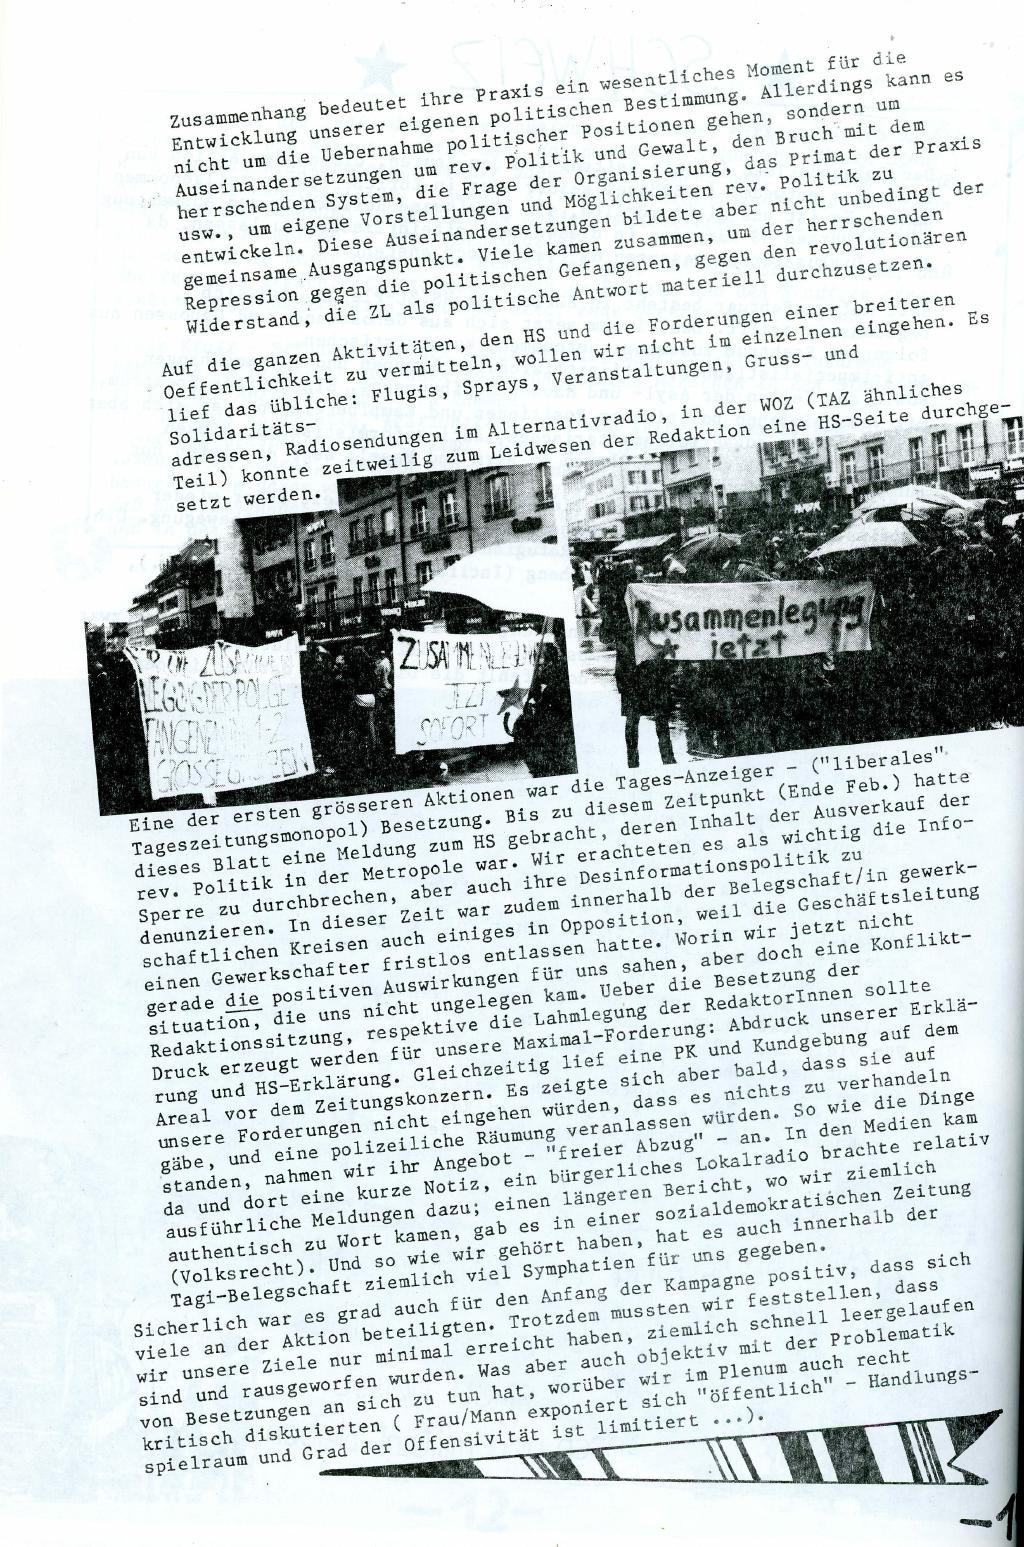 Belgien_Doku_Besetzung_EG_Kommission_1989_016